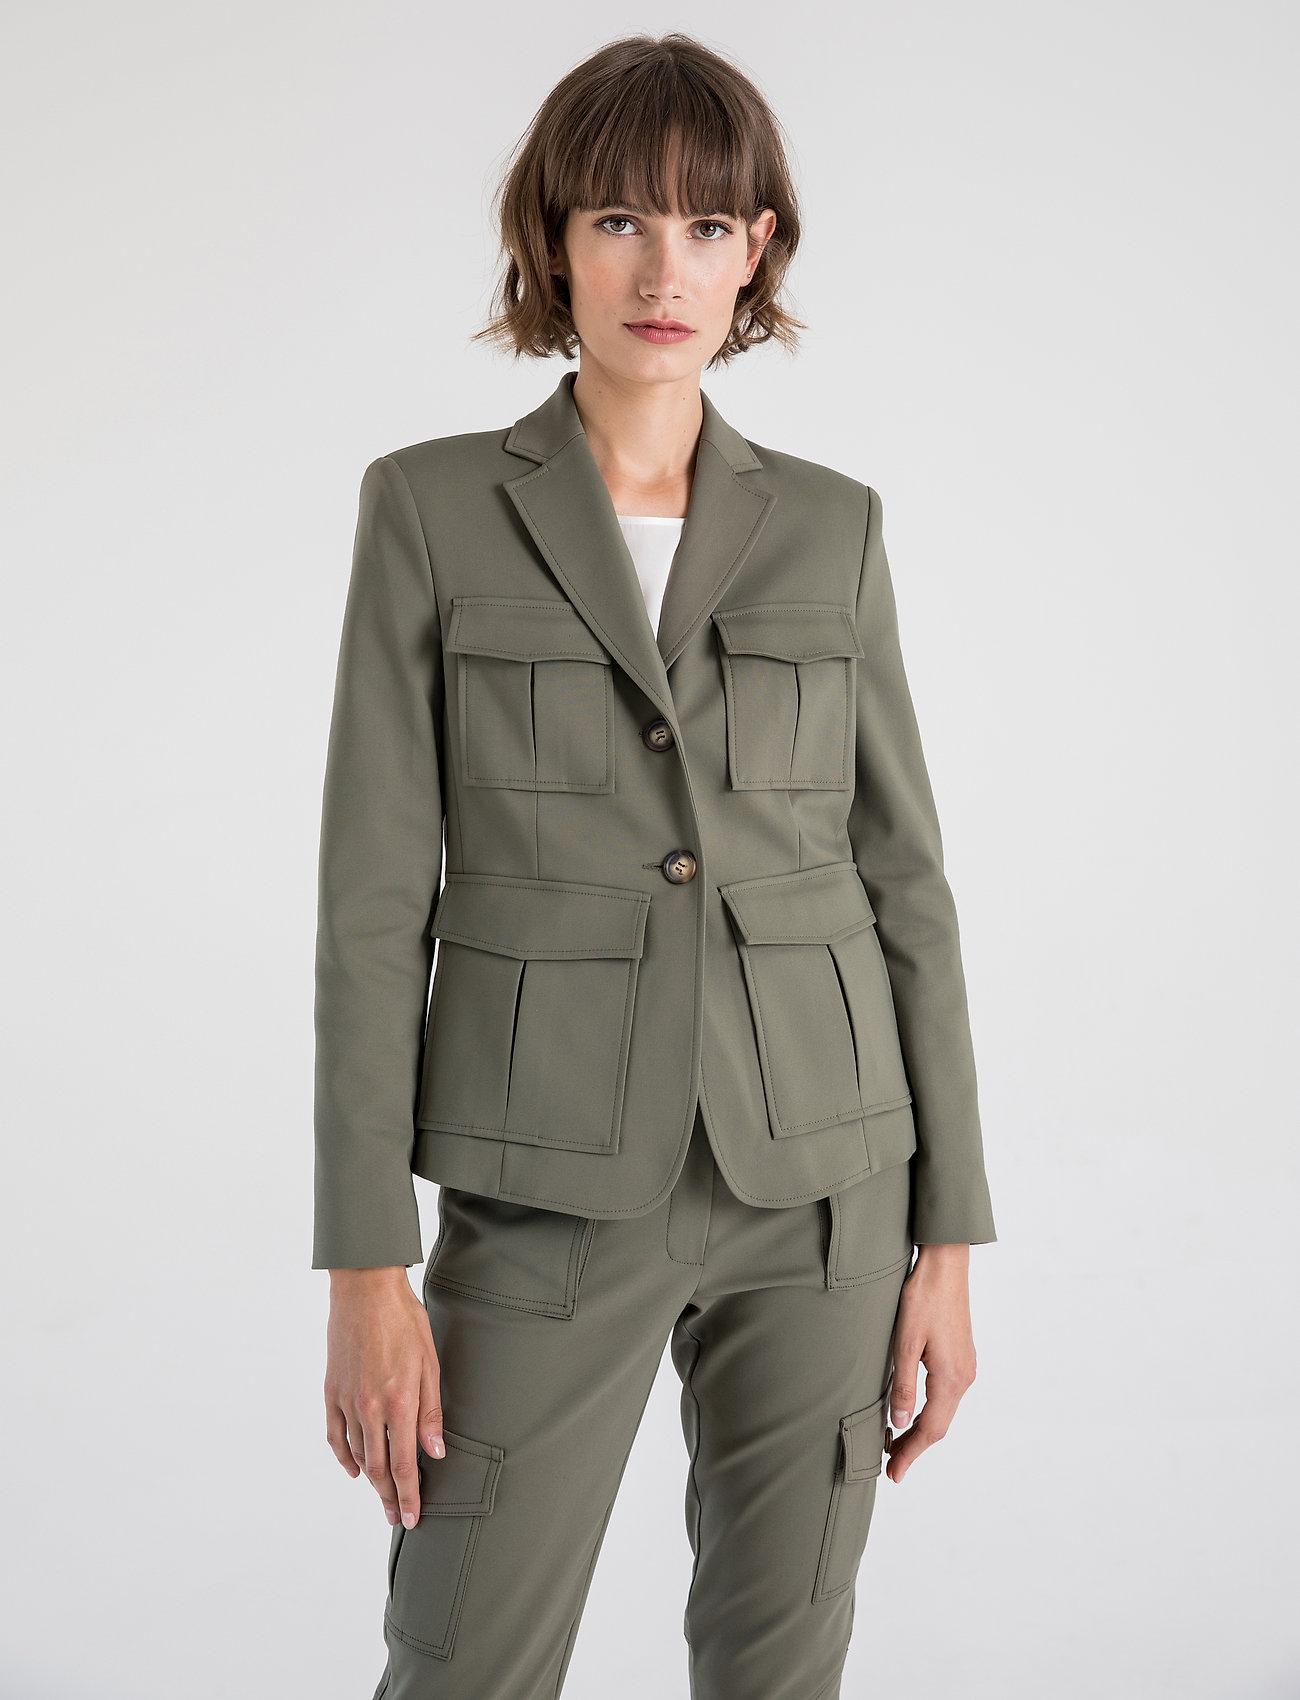 Andiata - CIANA BLAZER - blazers - kalamata green - 0